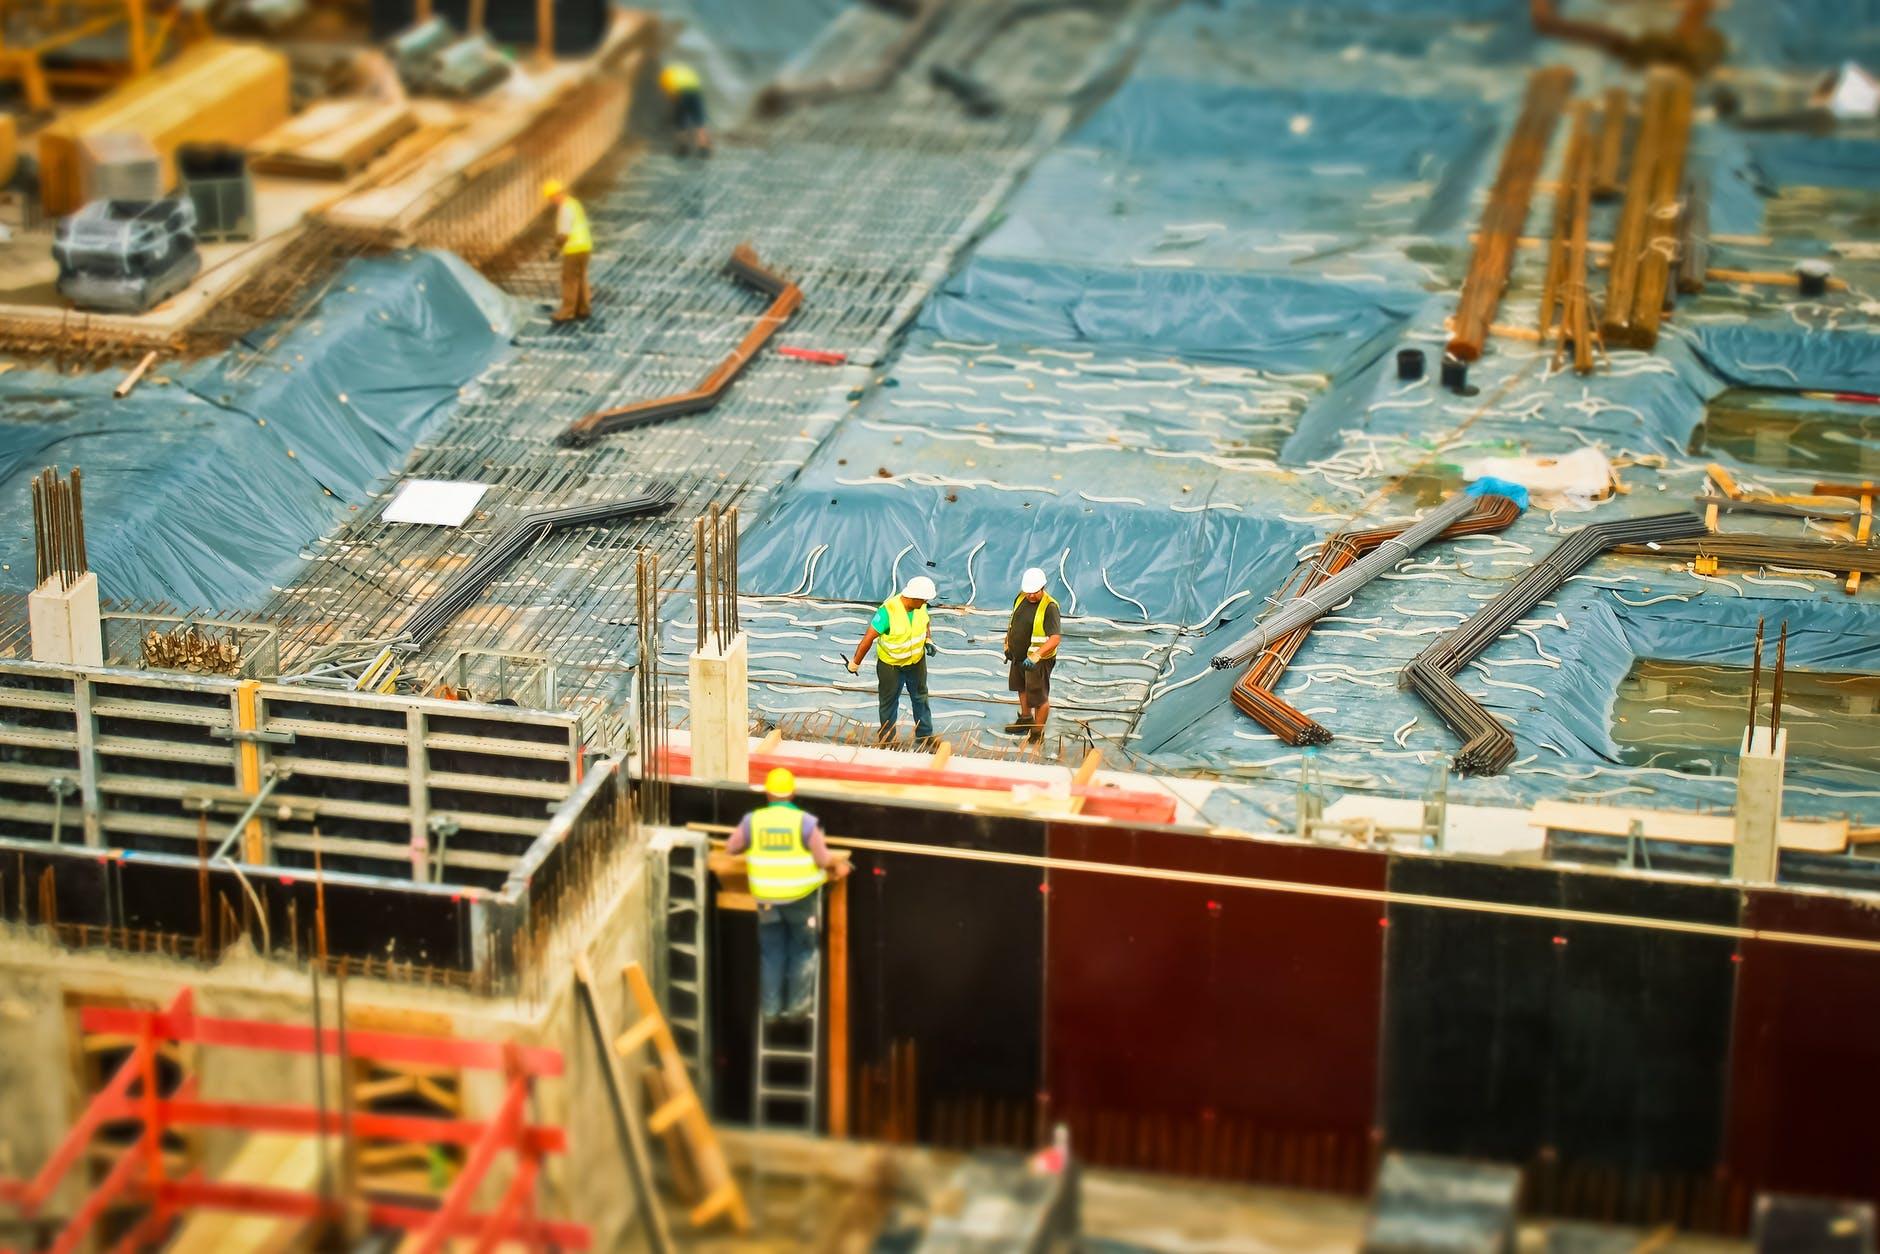 La construction redémarre en s'adaptant